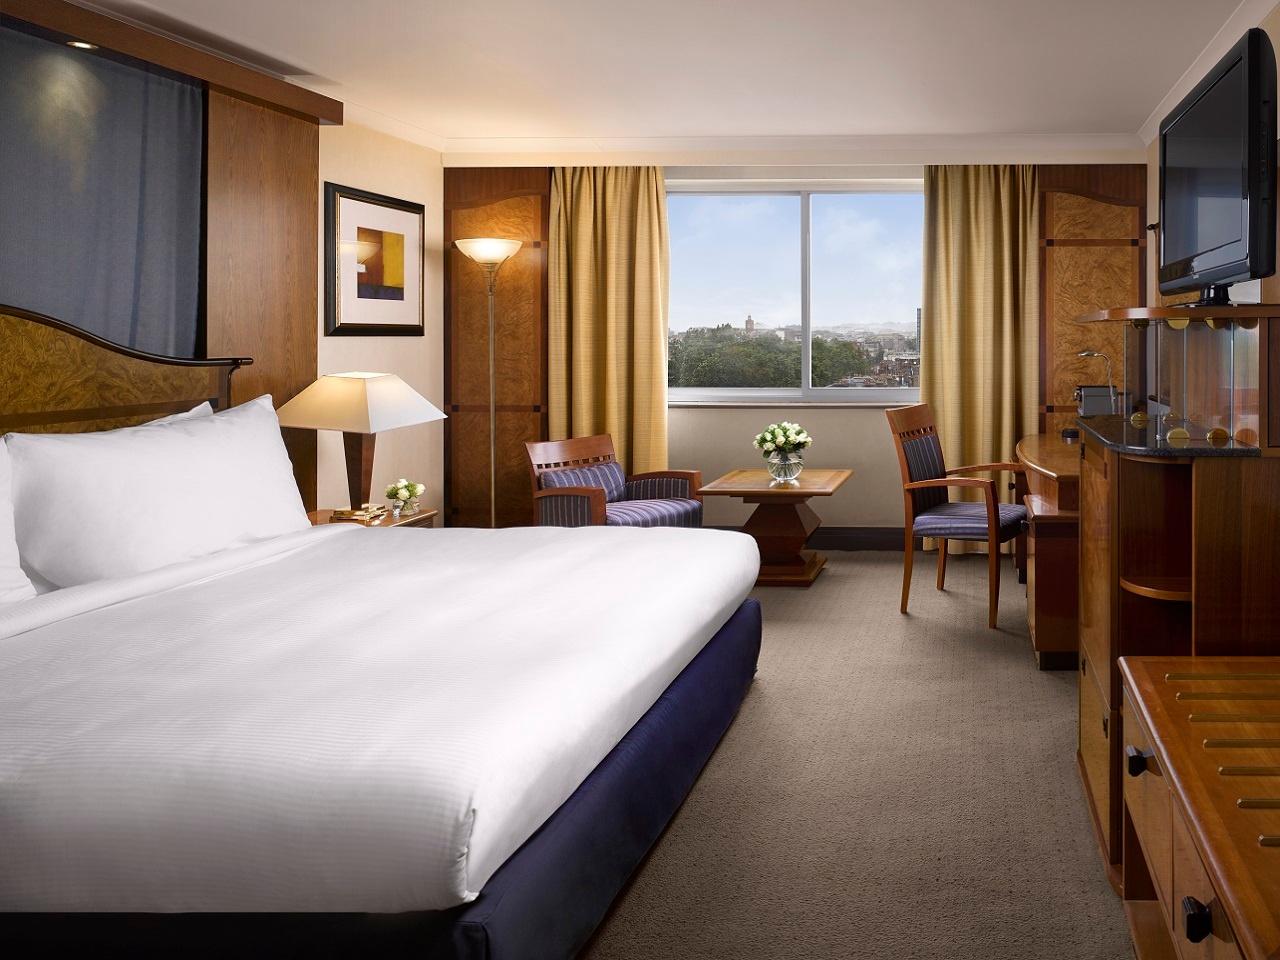 Radisson blu_rooms-5-business_1280x960